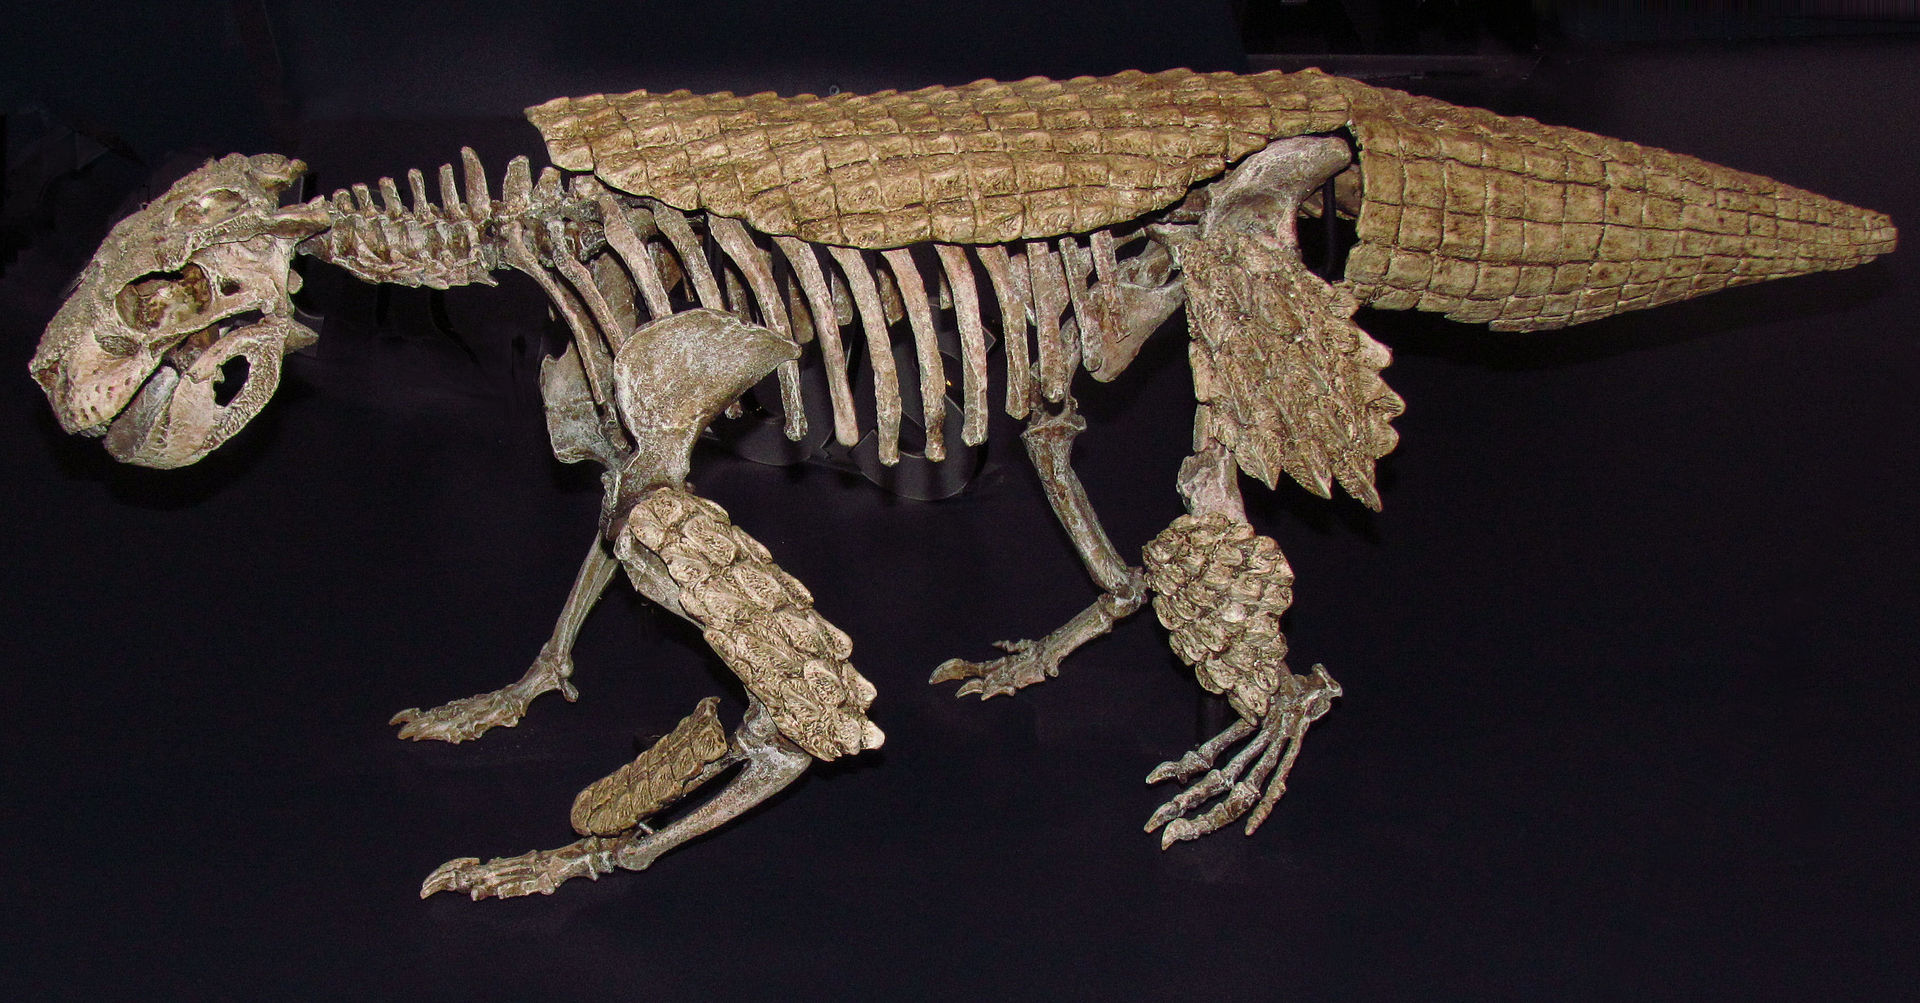 http://upload.wikimedia.org/wikipedia/commons/thumb/a/a1/Simosuchus_clarki%2C_ROM.jpg/1920px-Simosuchus_clarki%2C_ROM.jpg